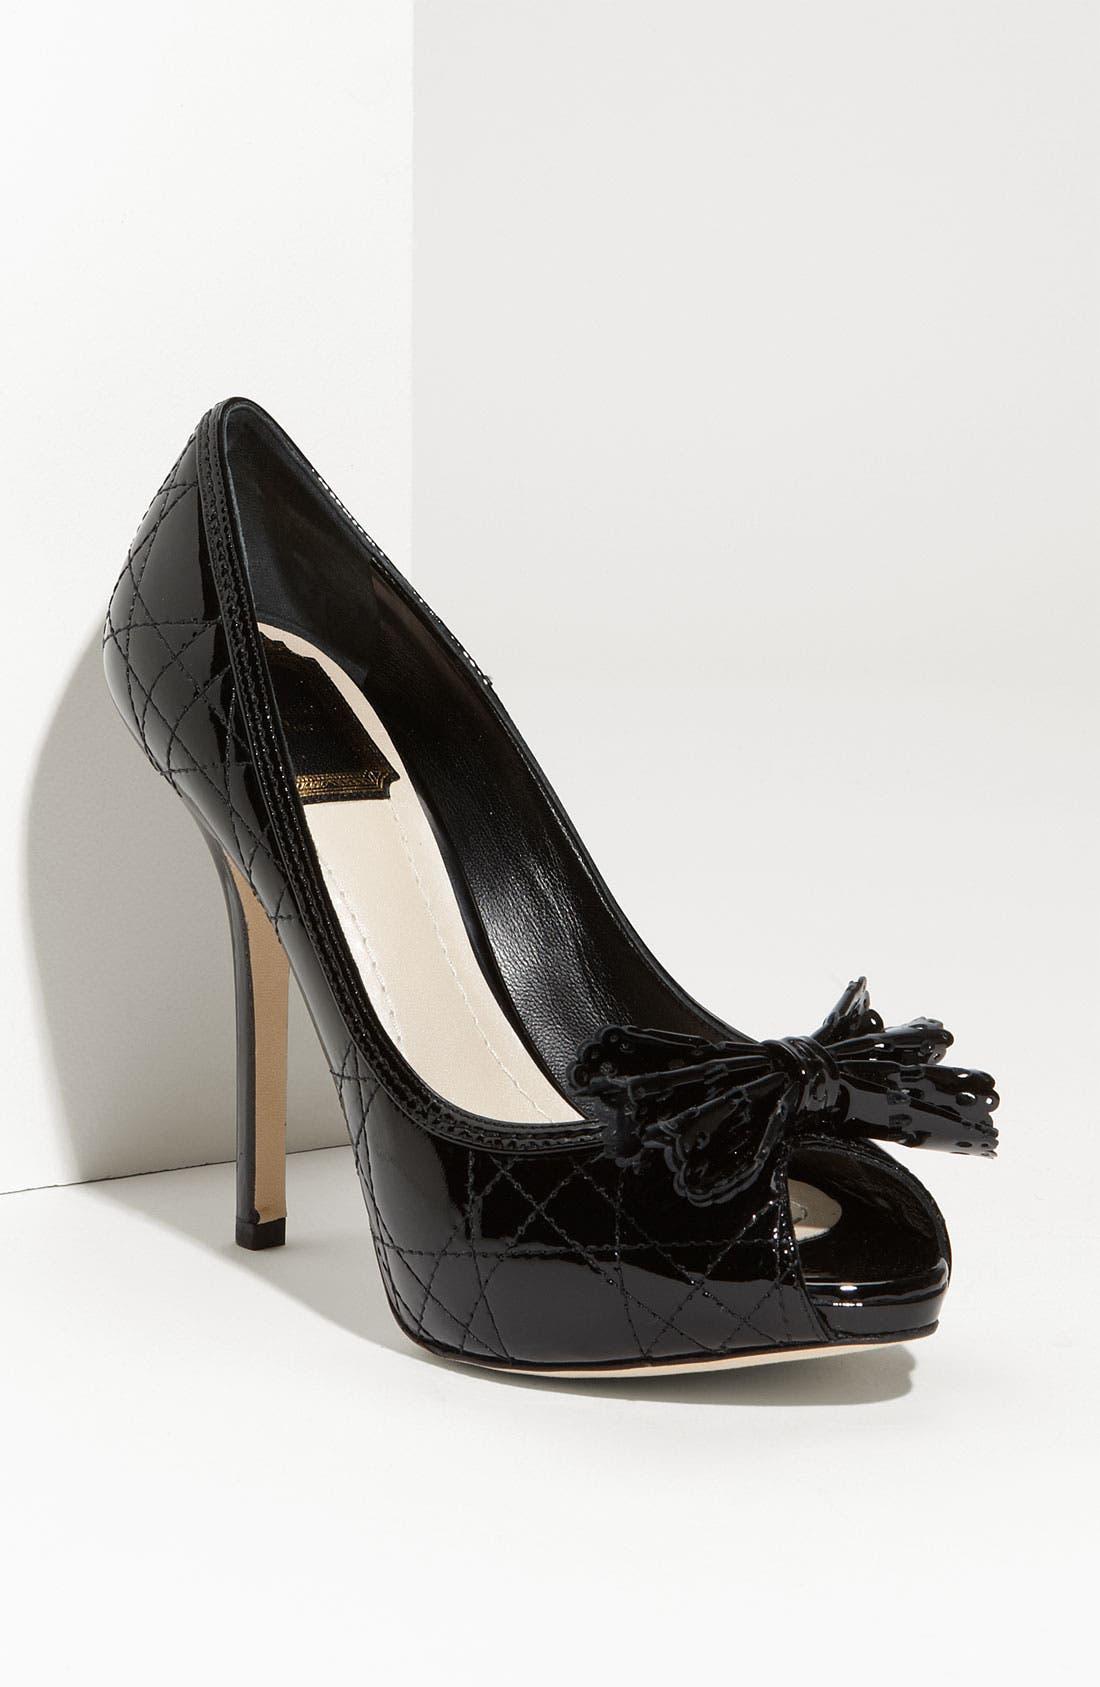 Alternate Image 1 Selected - Dior Cannage Stitch Peep Toe Pump